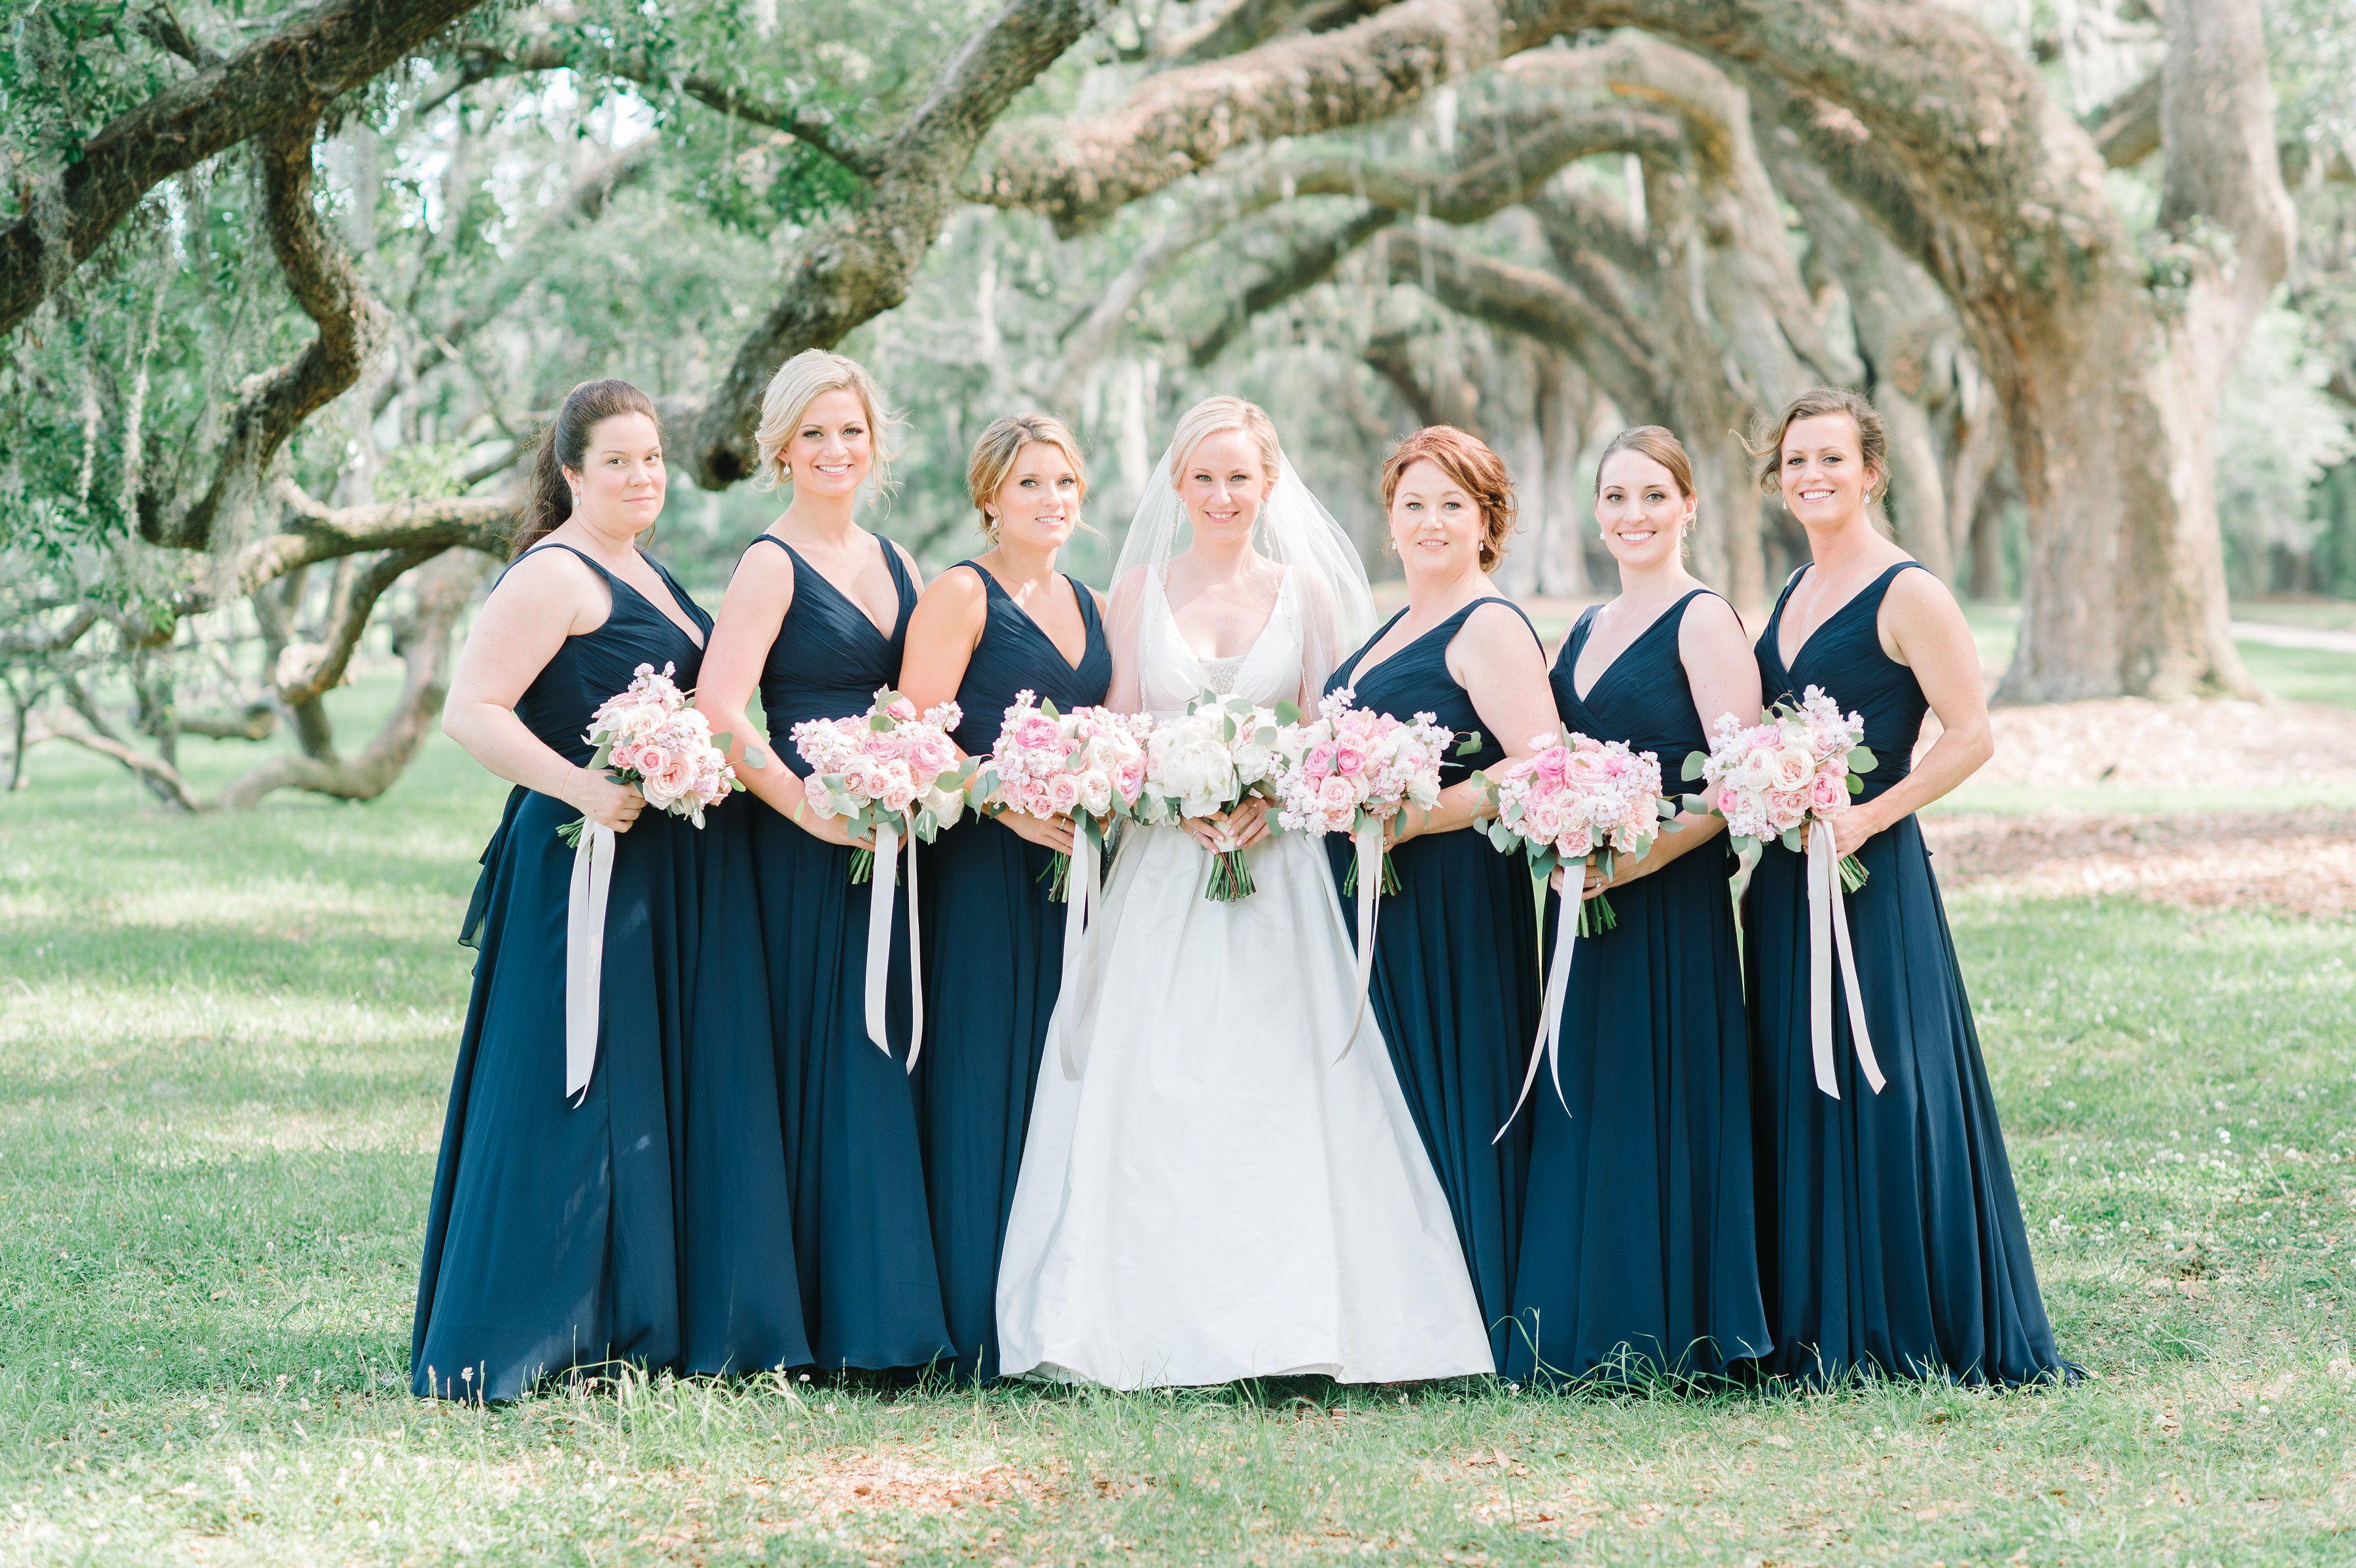 Nyc Bridesmaid Dresses Shop In Store Bella Bridesmaids Bella Bridesmaid Blue Wedding Inspiration Latest Bridesmaid Dresses